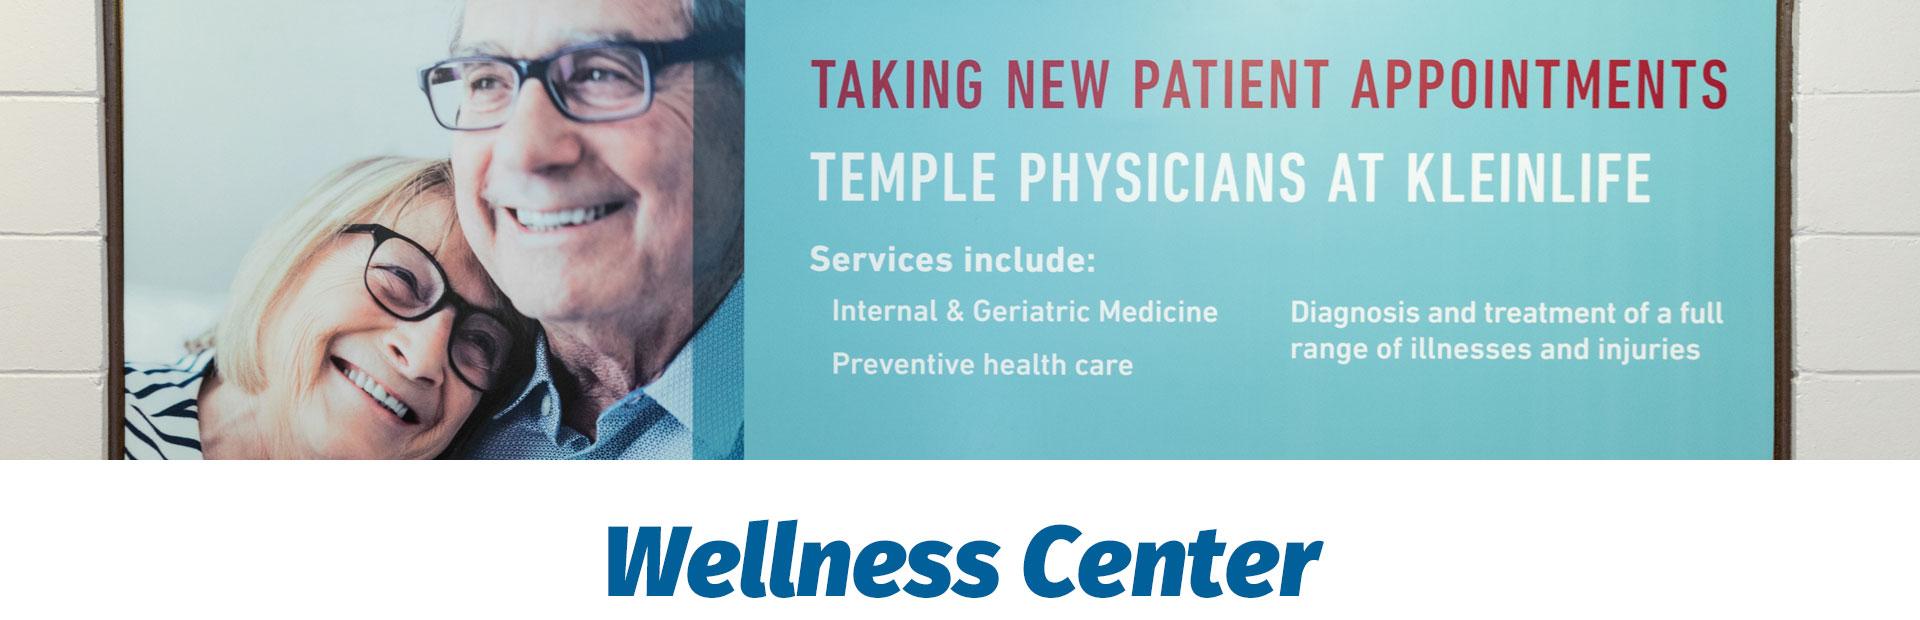 Kleinlife wellness center, wellness center in kleinlife, active adult community